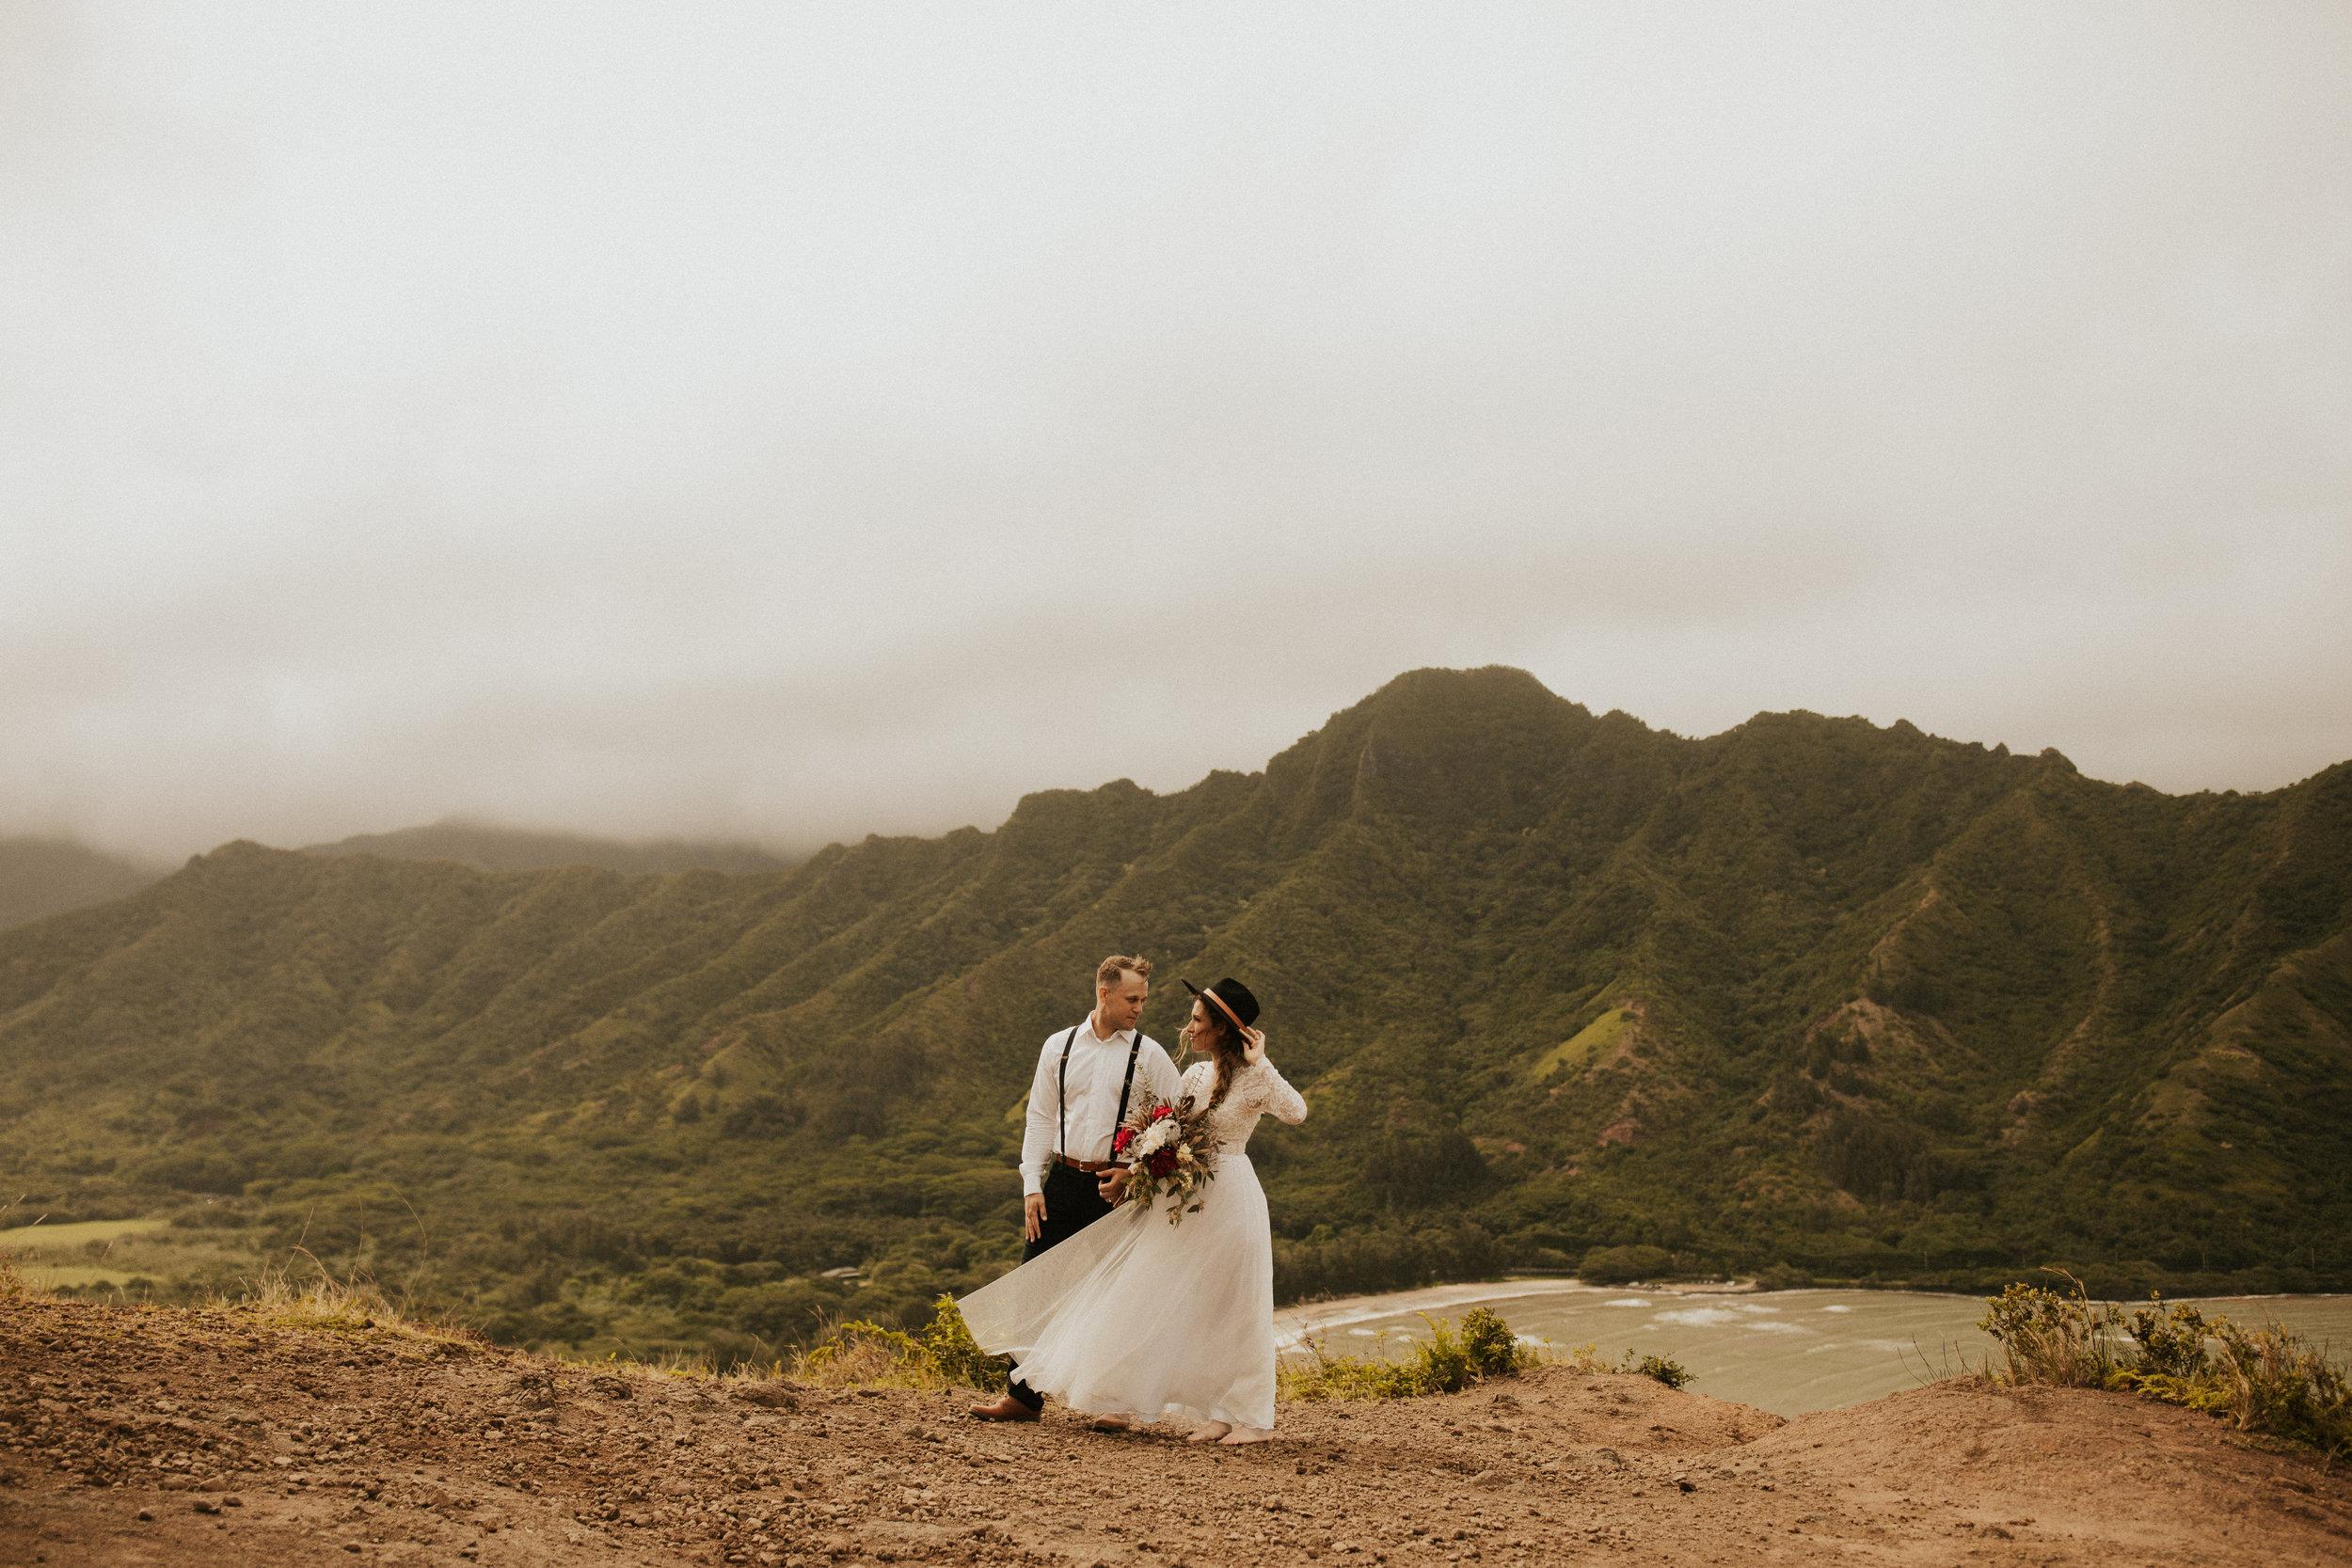 the-mclachlans-destination-elopement-photographers-mountain-hike-sena-eric-41.jpg